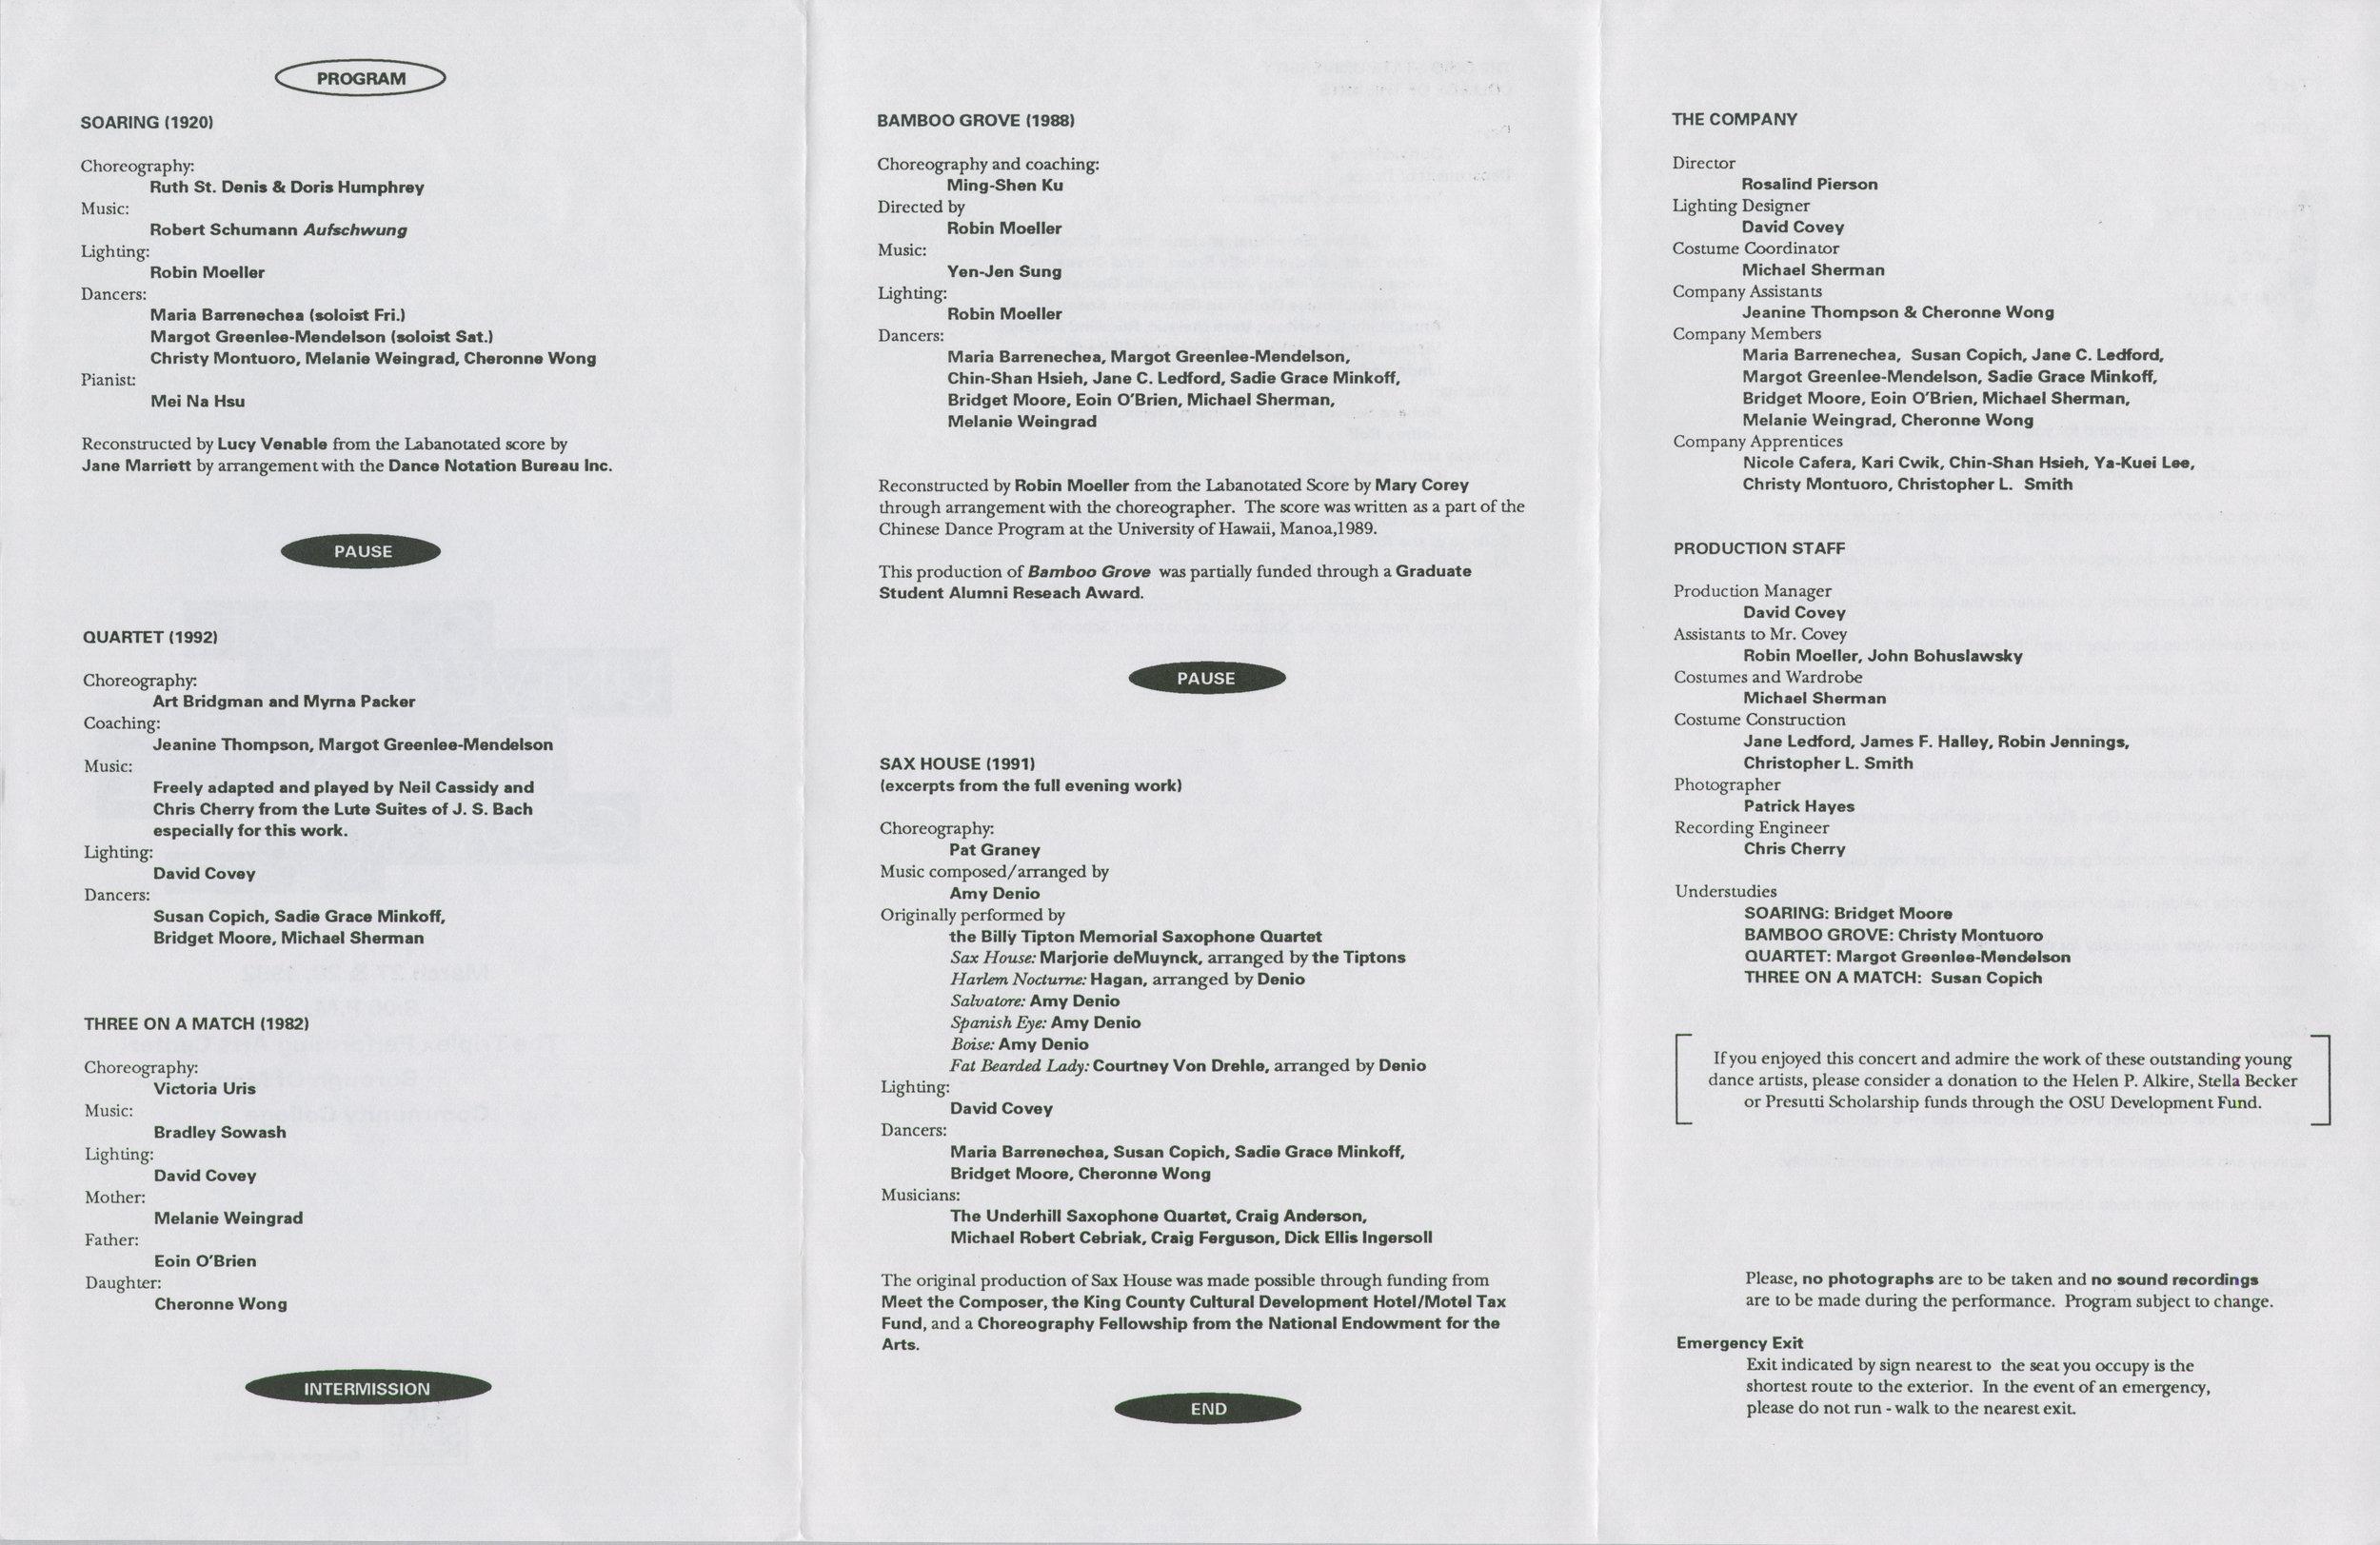 UDC_1992.2_DancePrograms-022-003.jpg